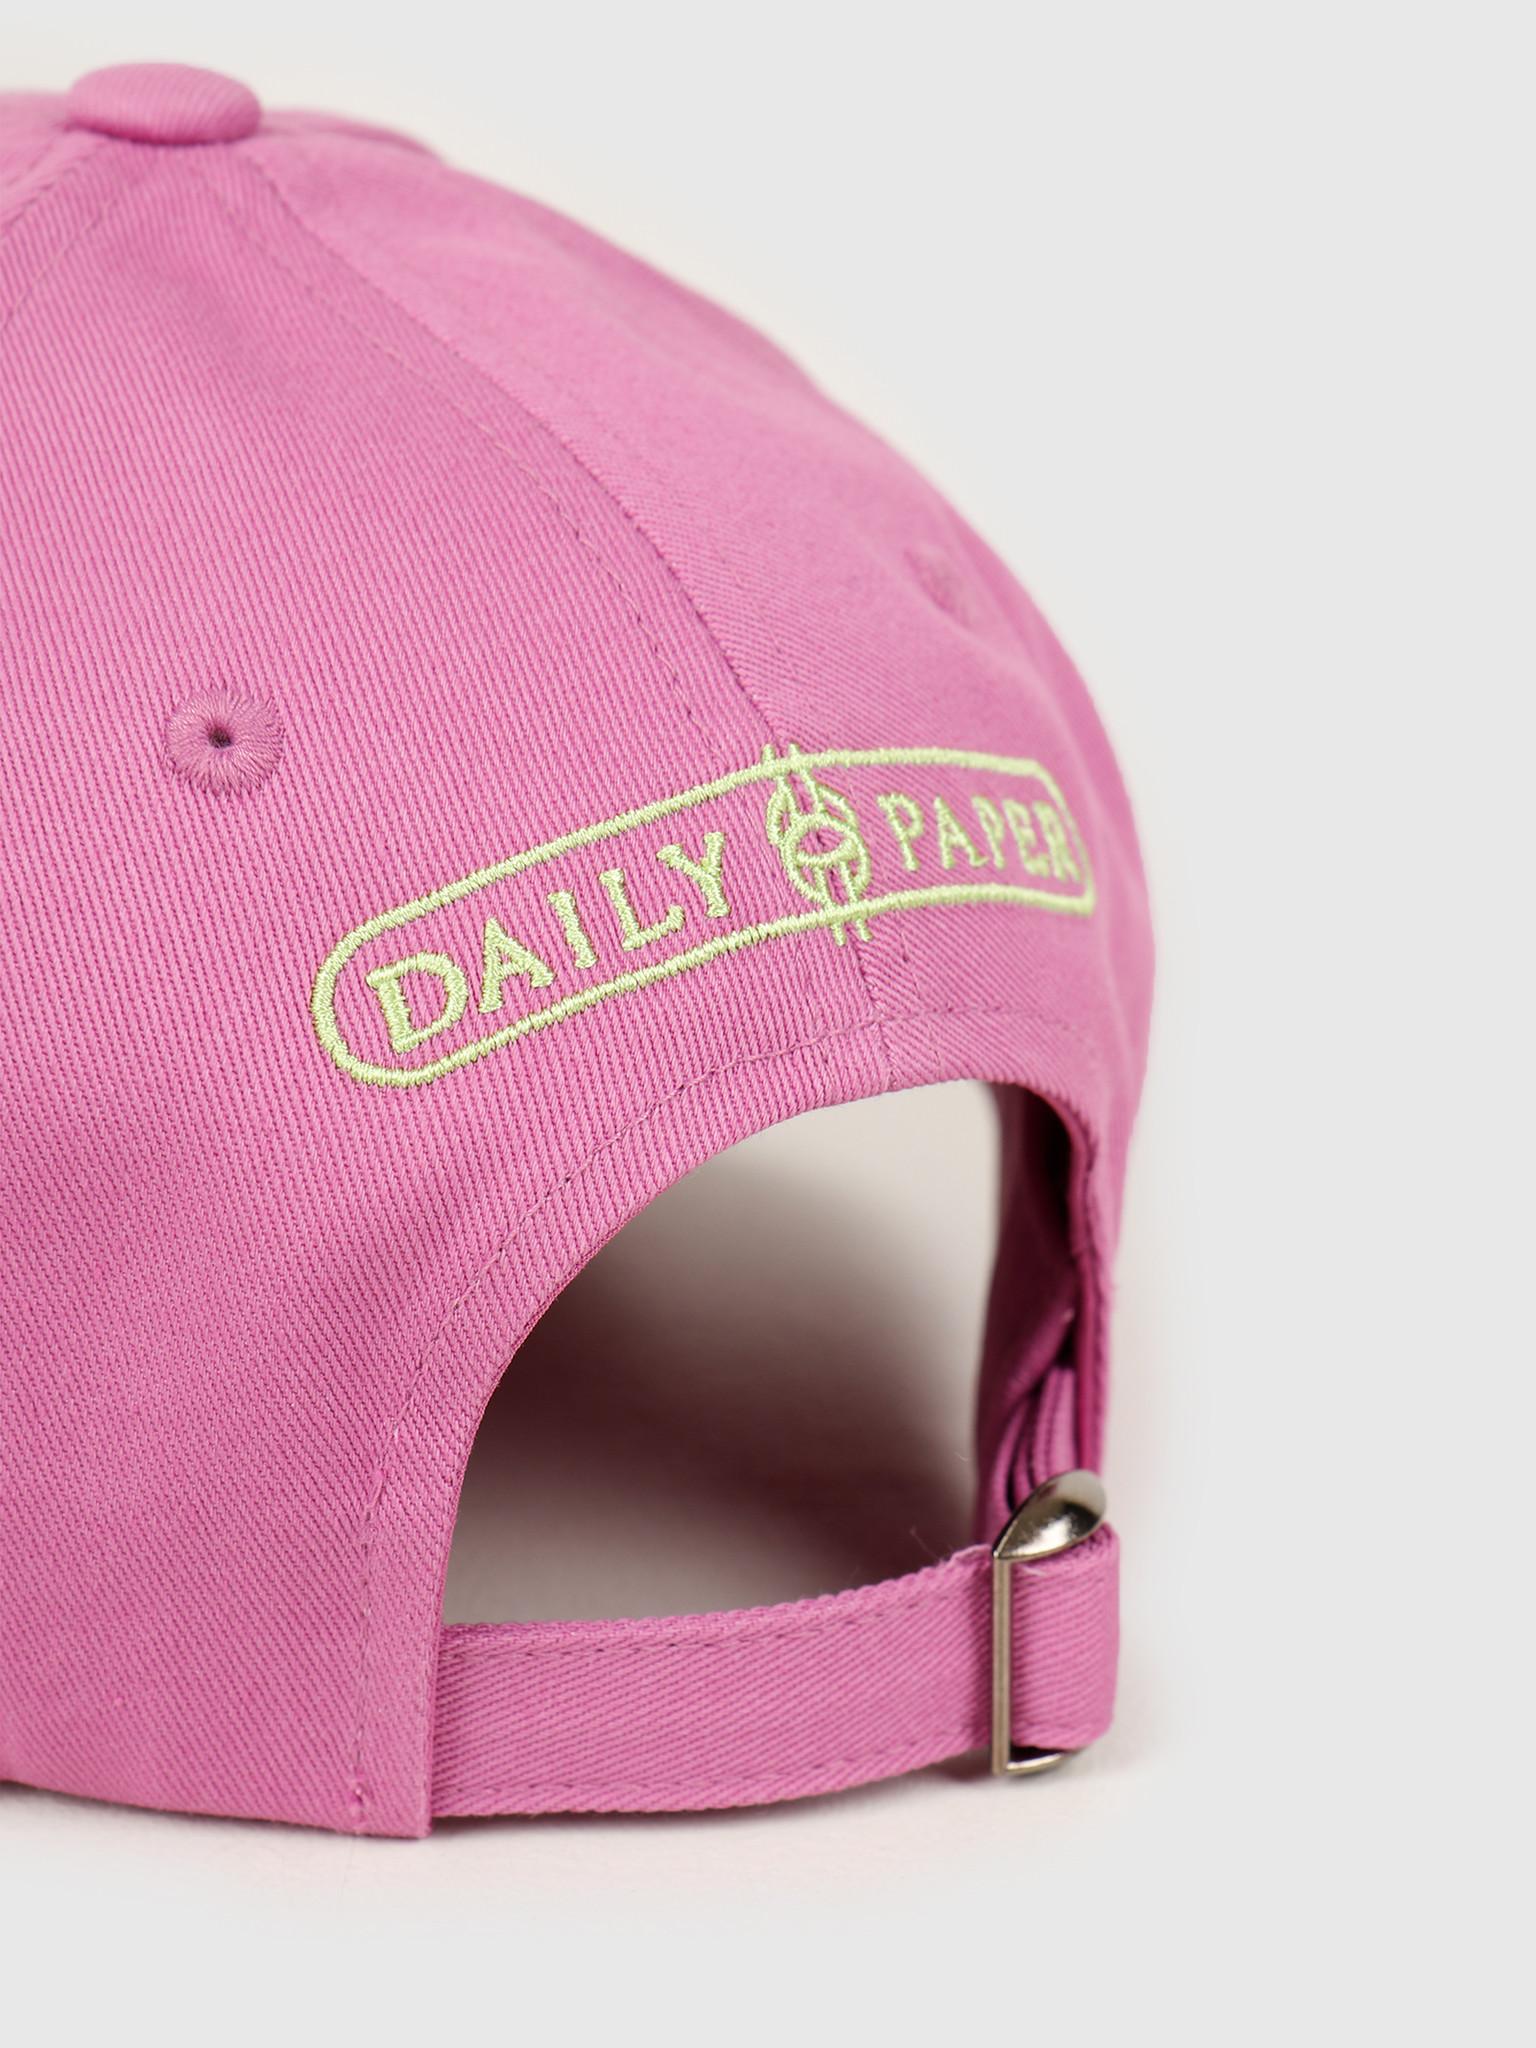 Daily Paper Daily Paper Hise Cap Lavender Purple 20S1AC25-01